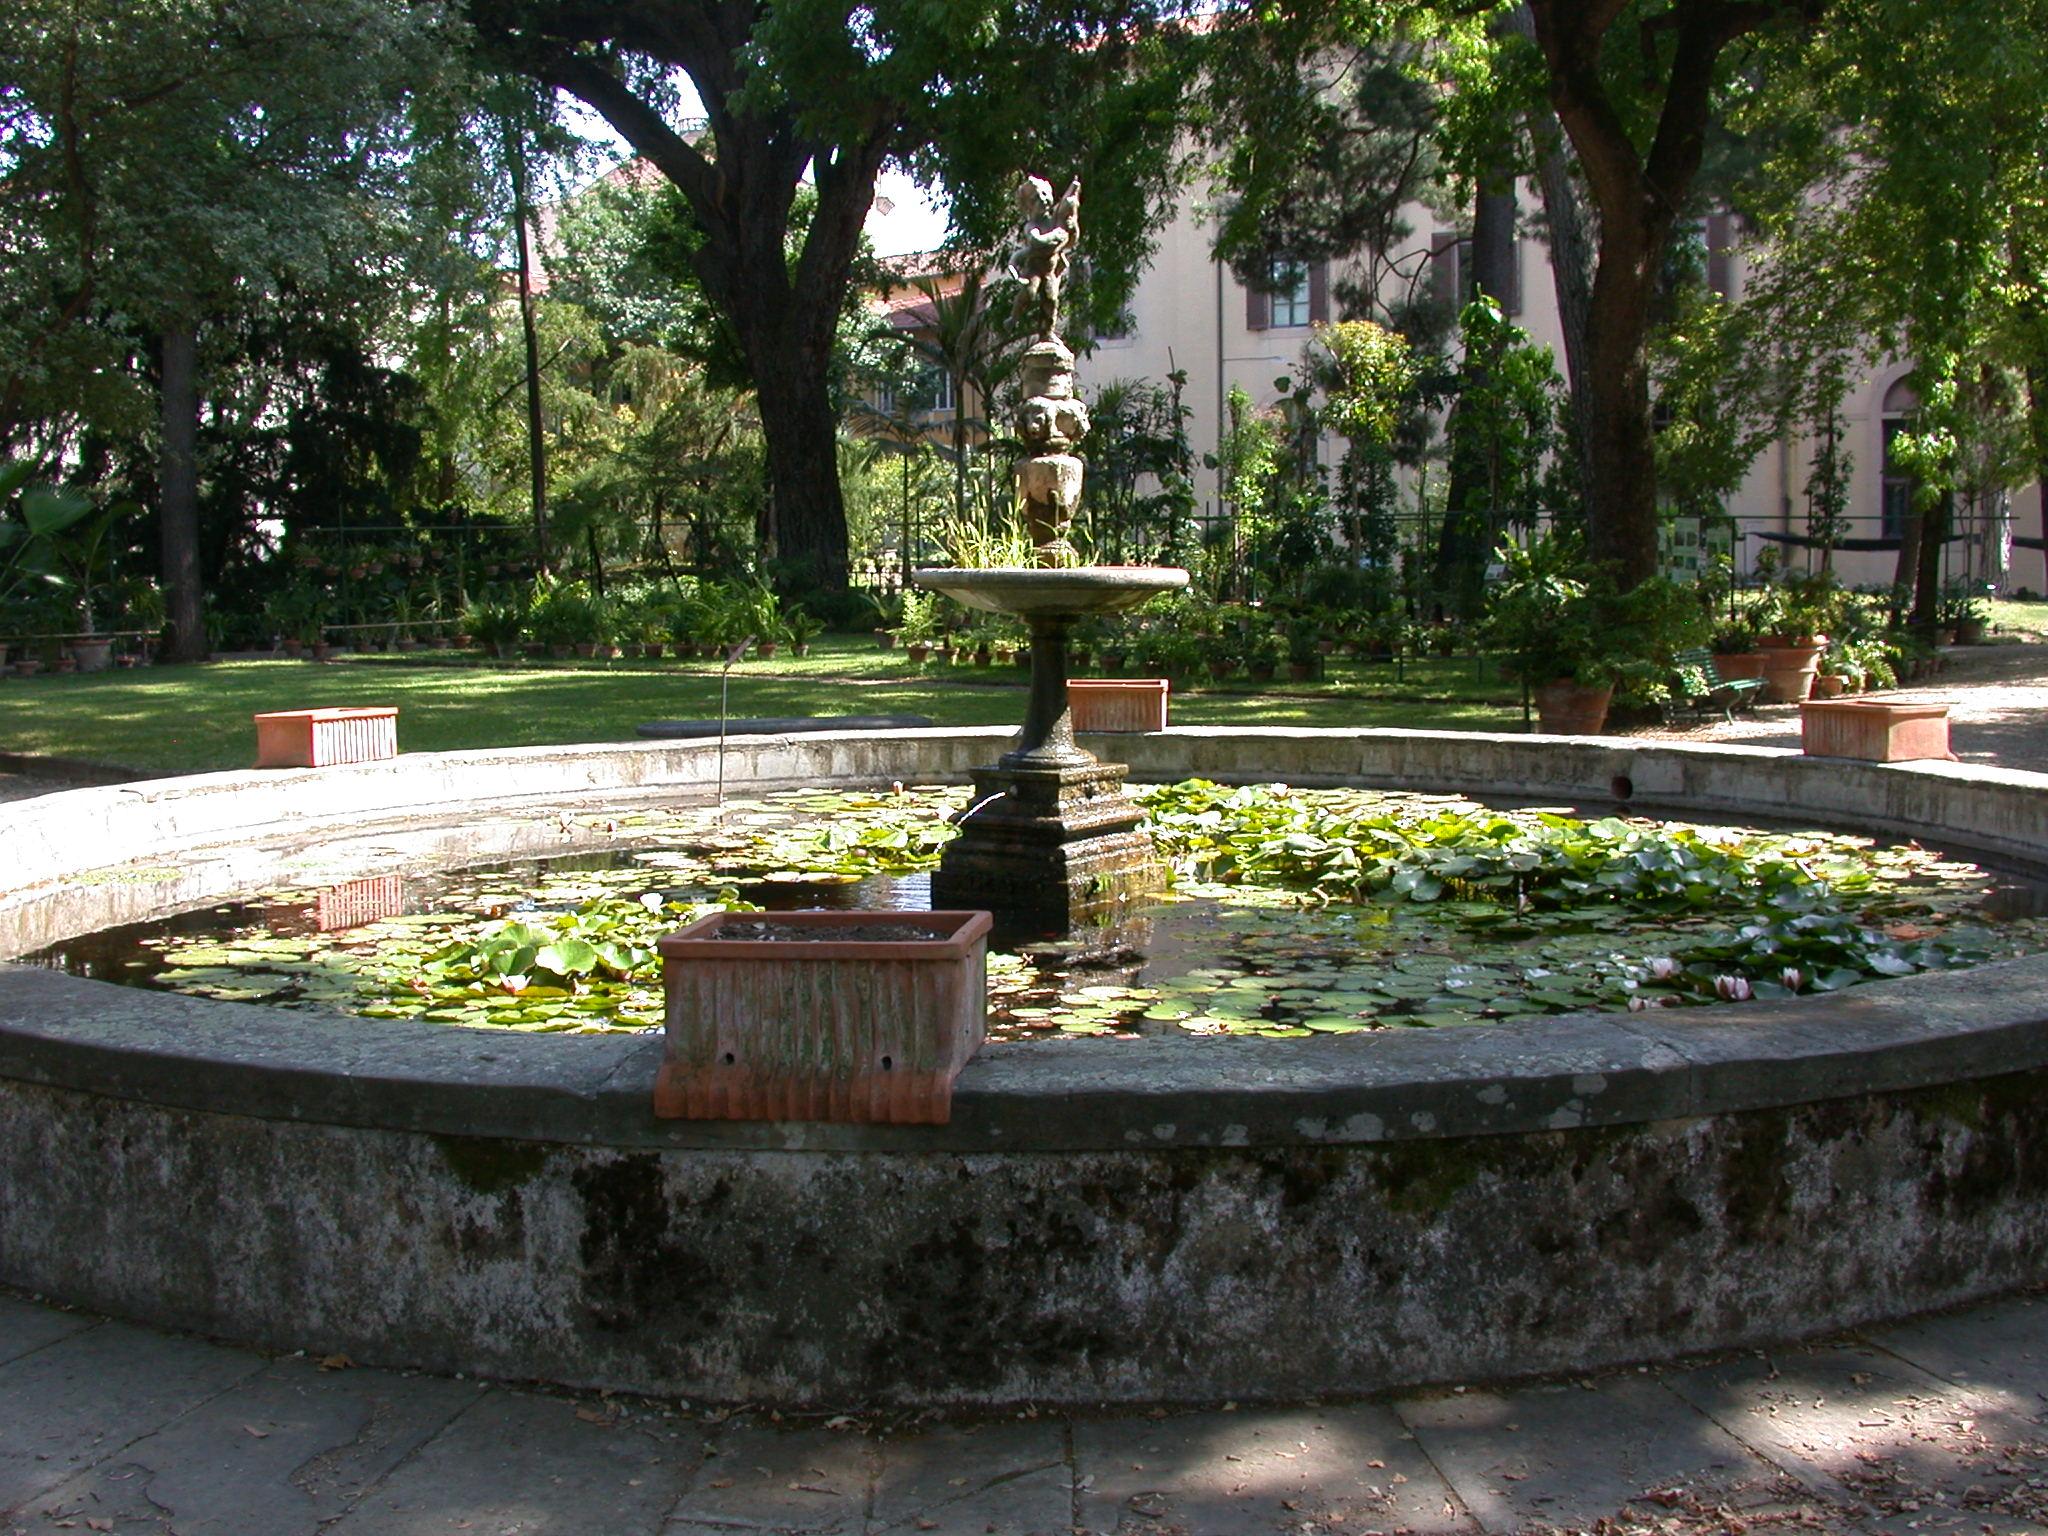 File:firenze giardino dei semplici fontana.jpg wikipedia